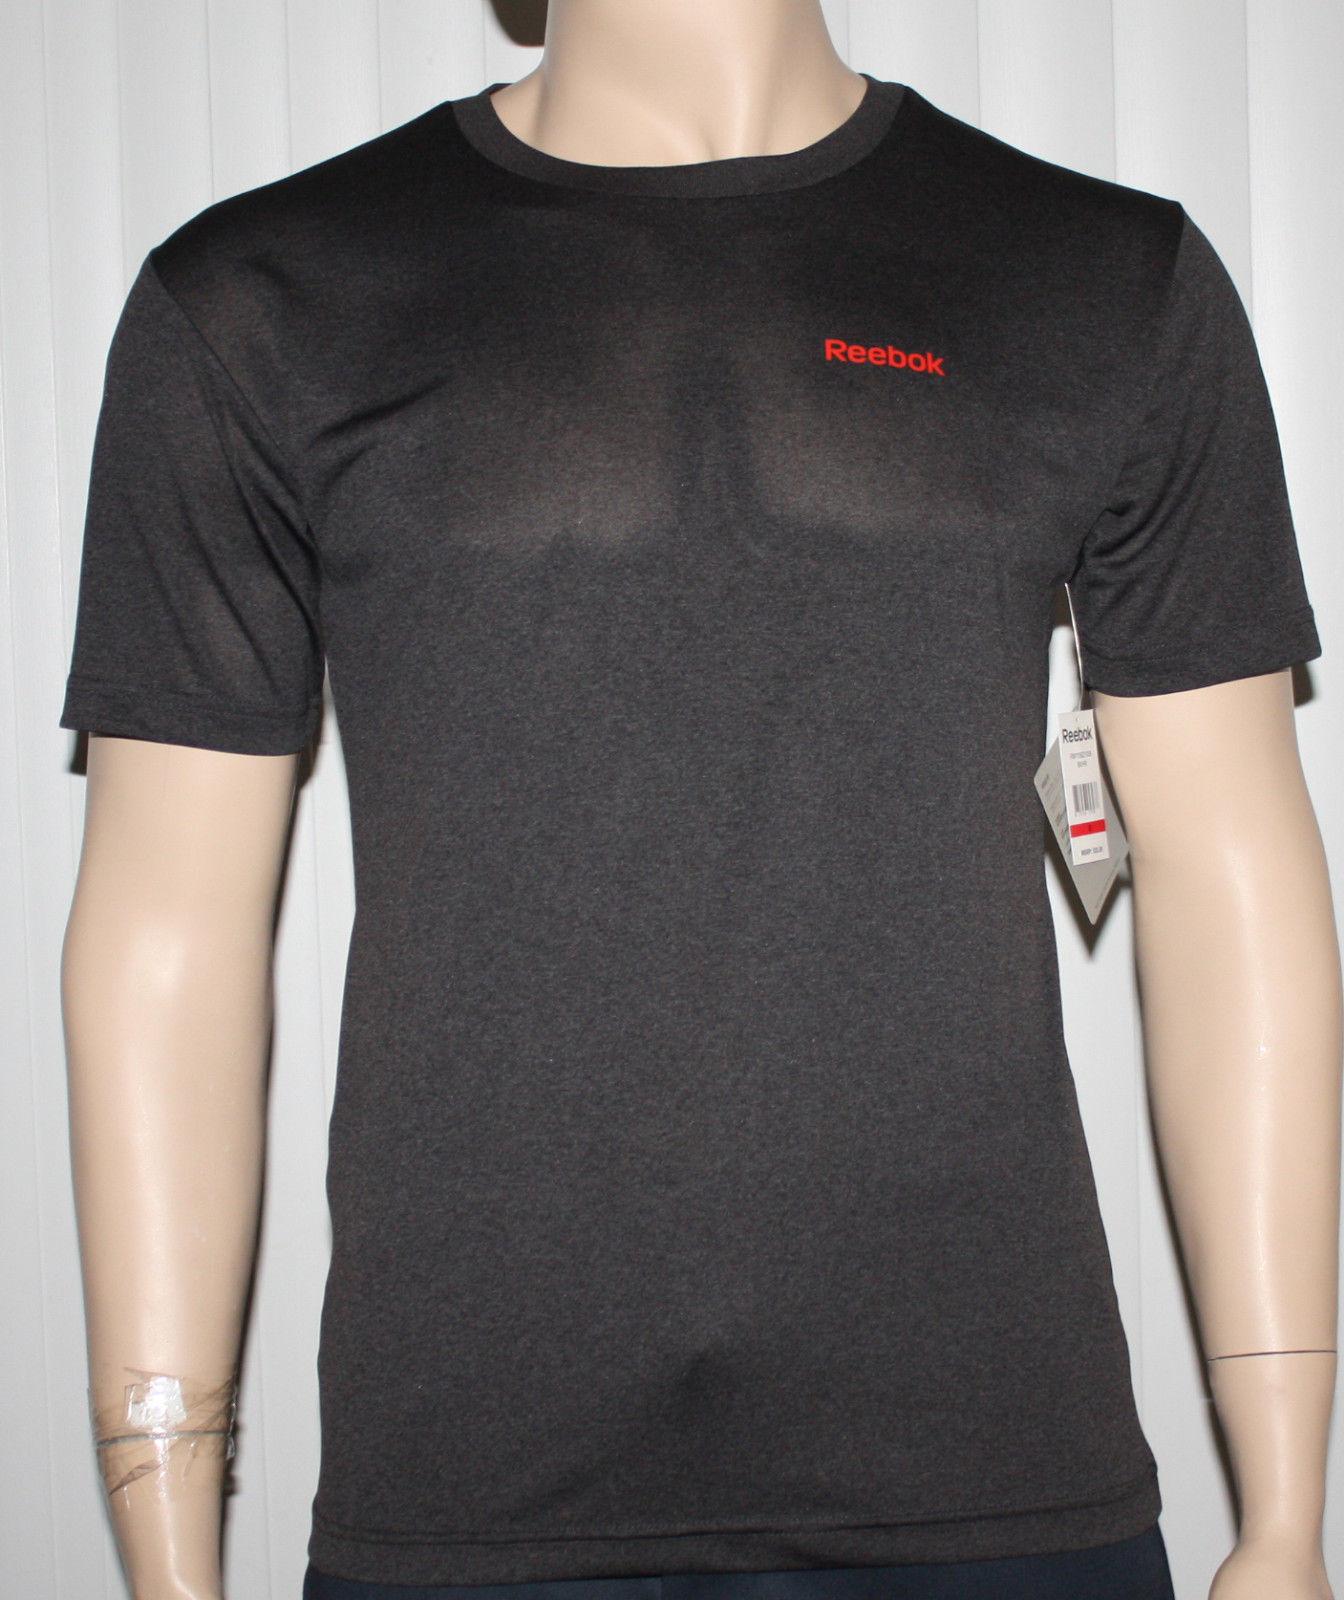 Reebok SPORT Regular Classic Fit Men's Black Heather/Red Reebok Shirt (Small) 10810